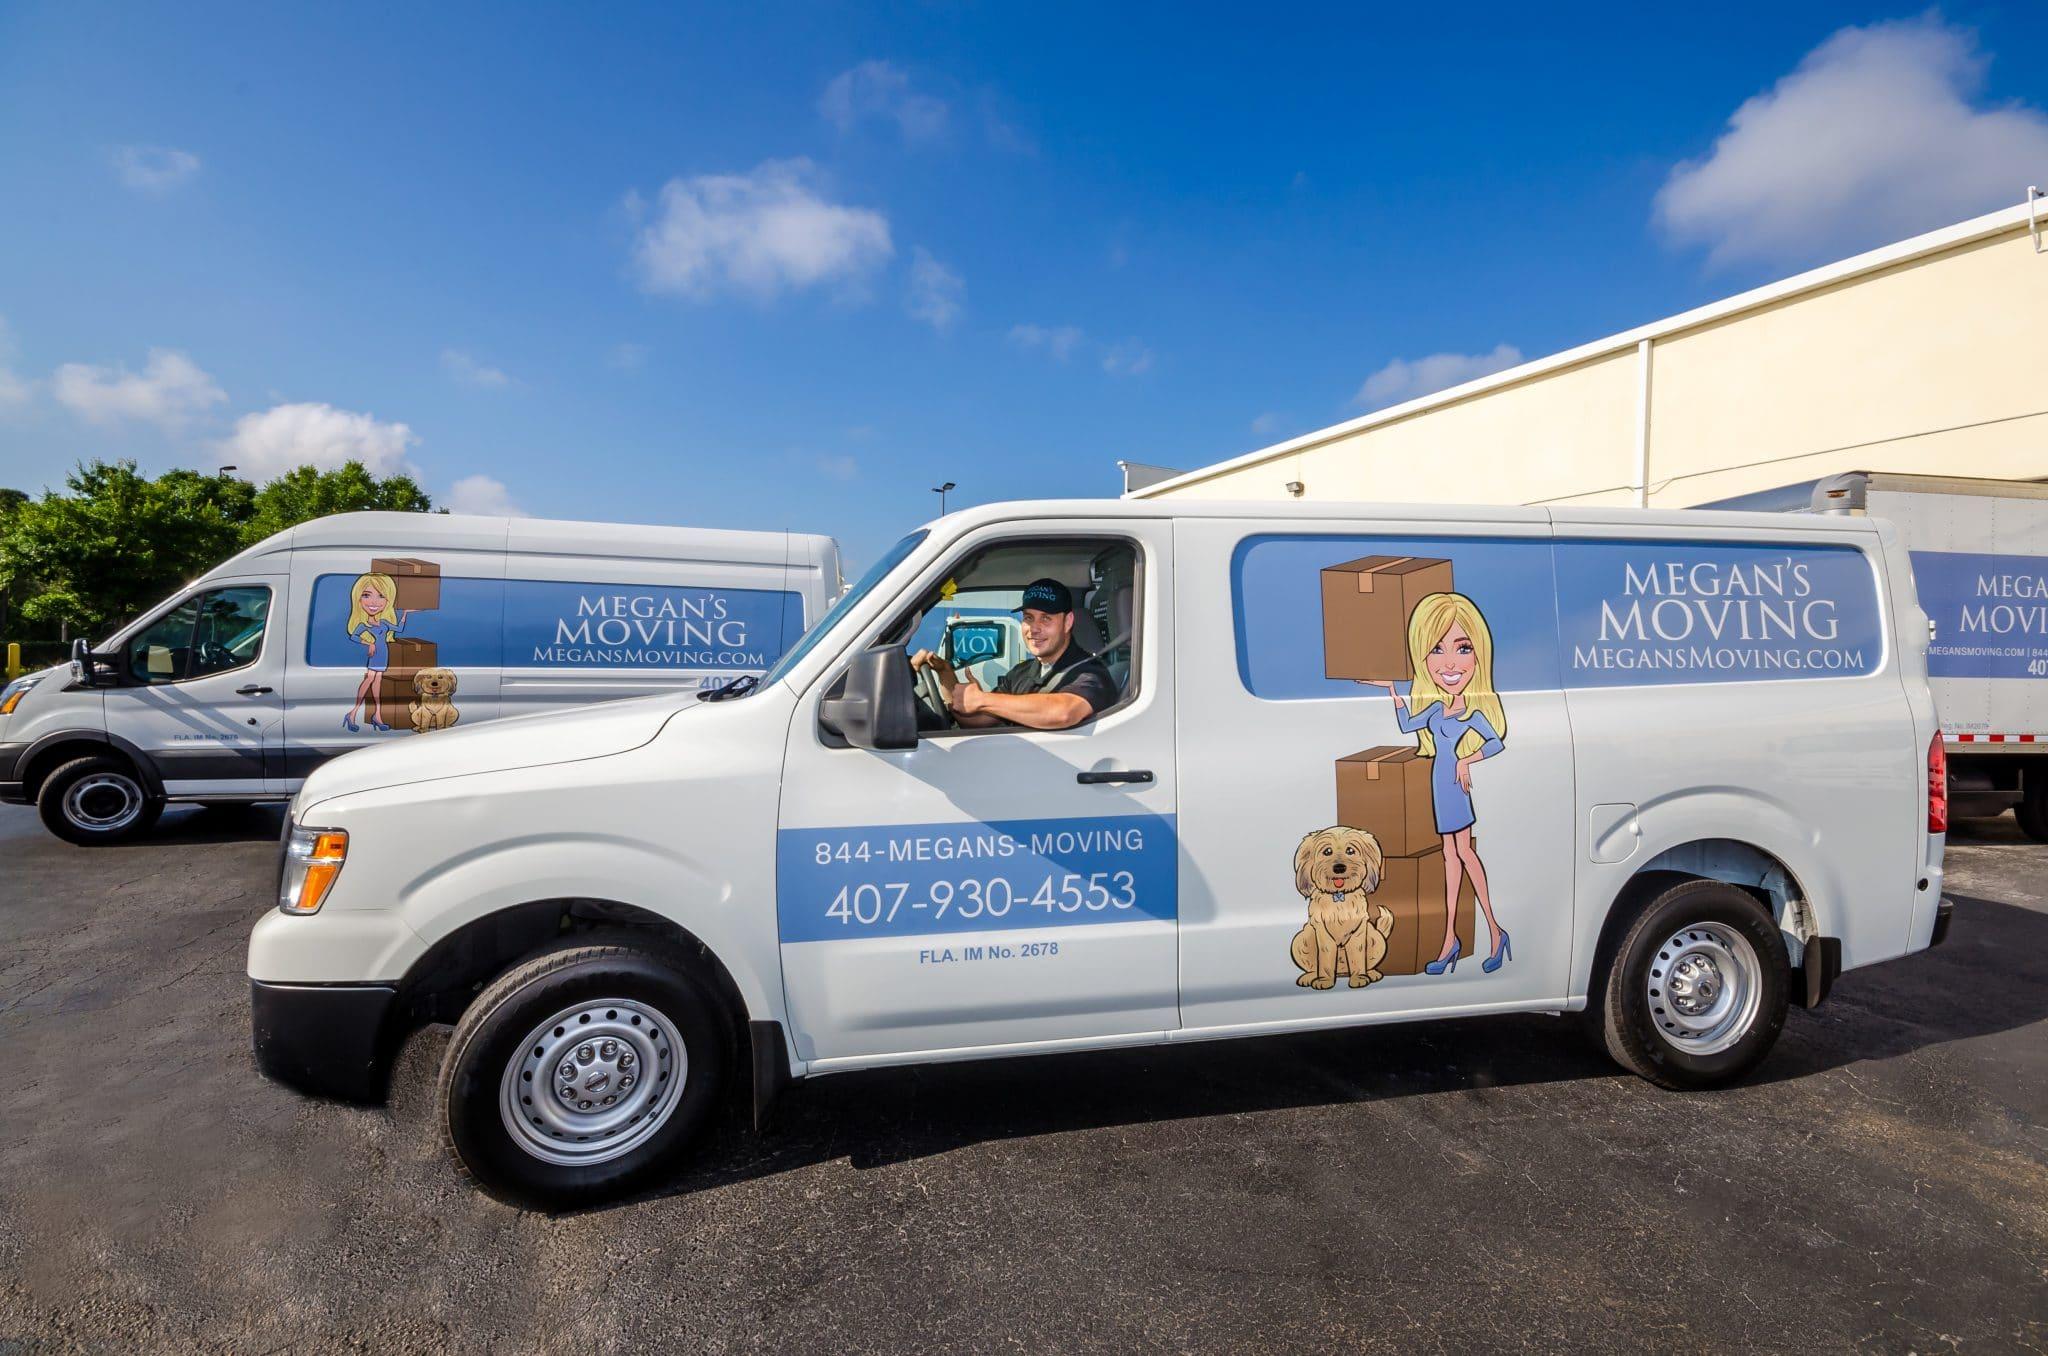 Megan's Moving van